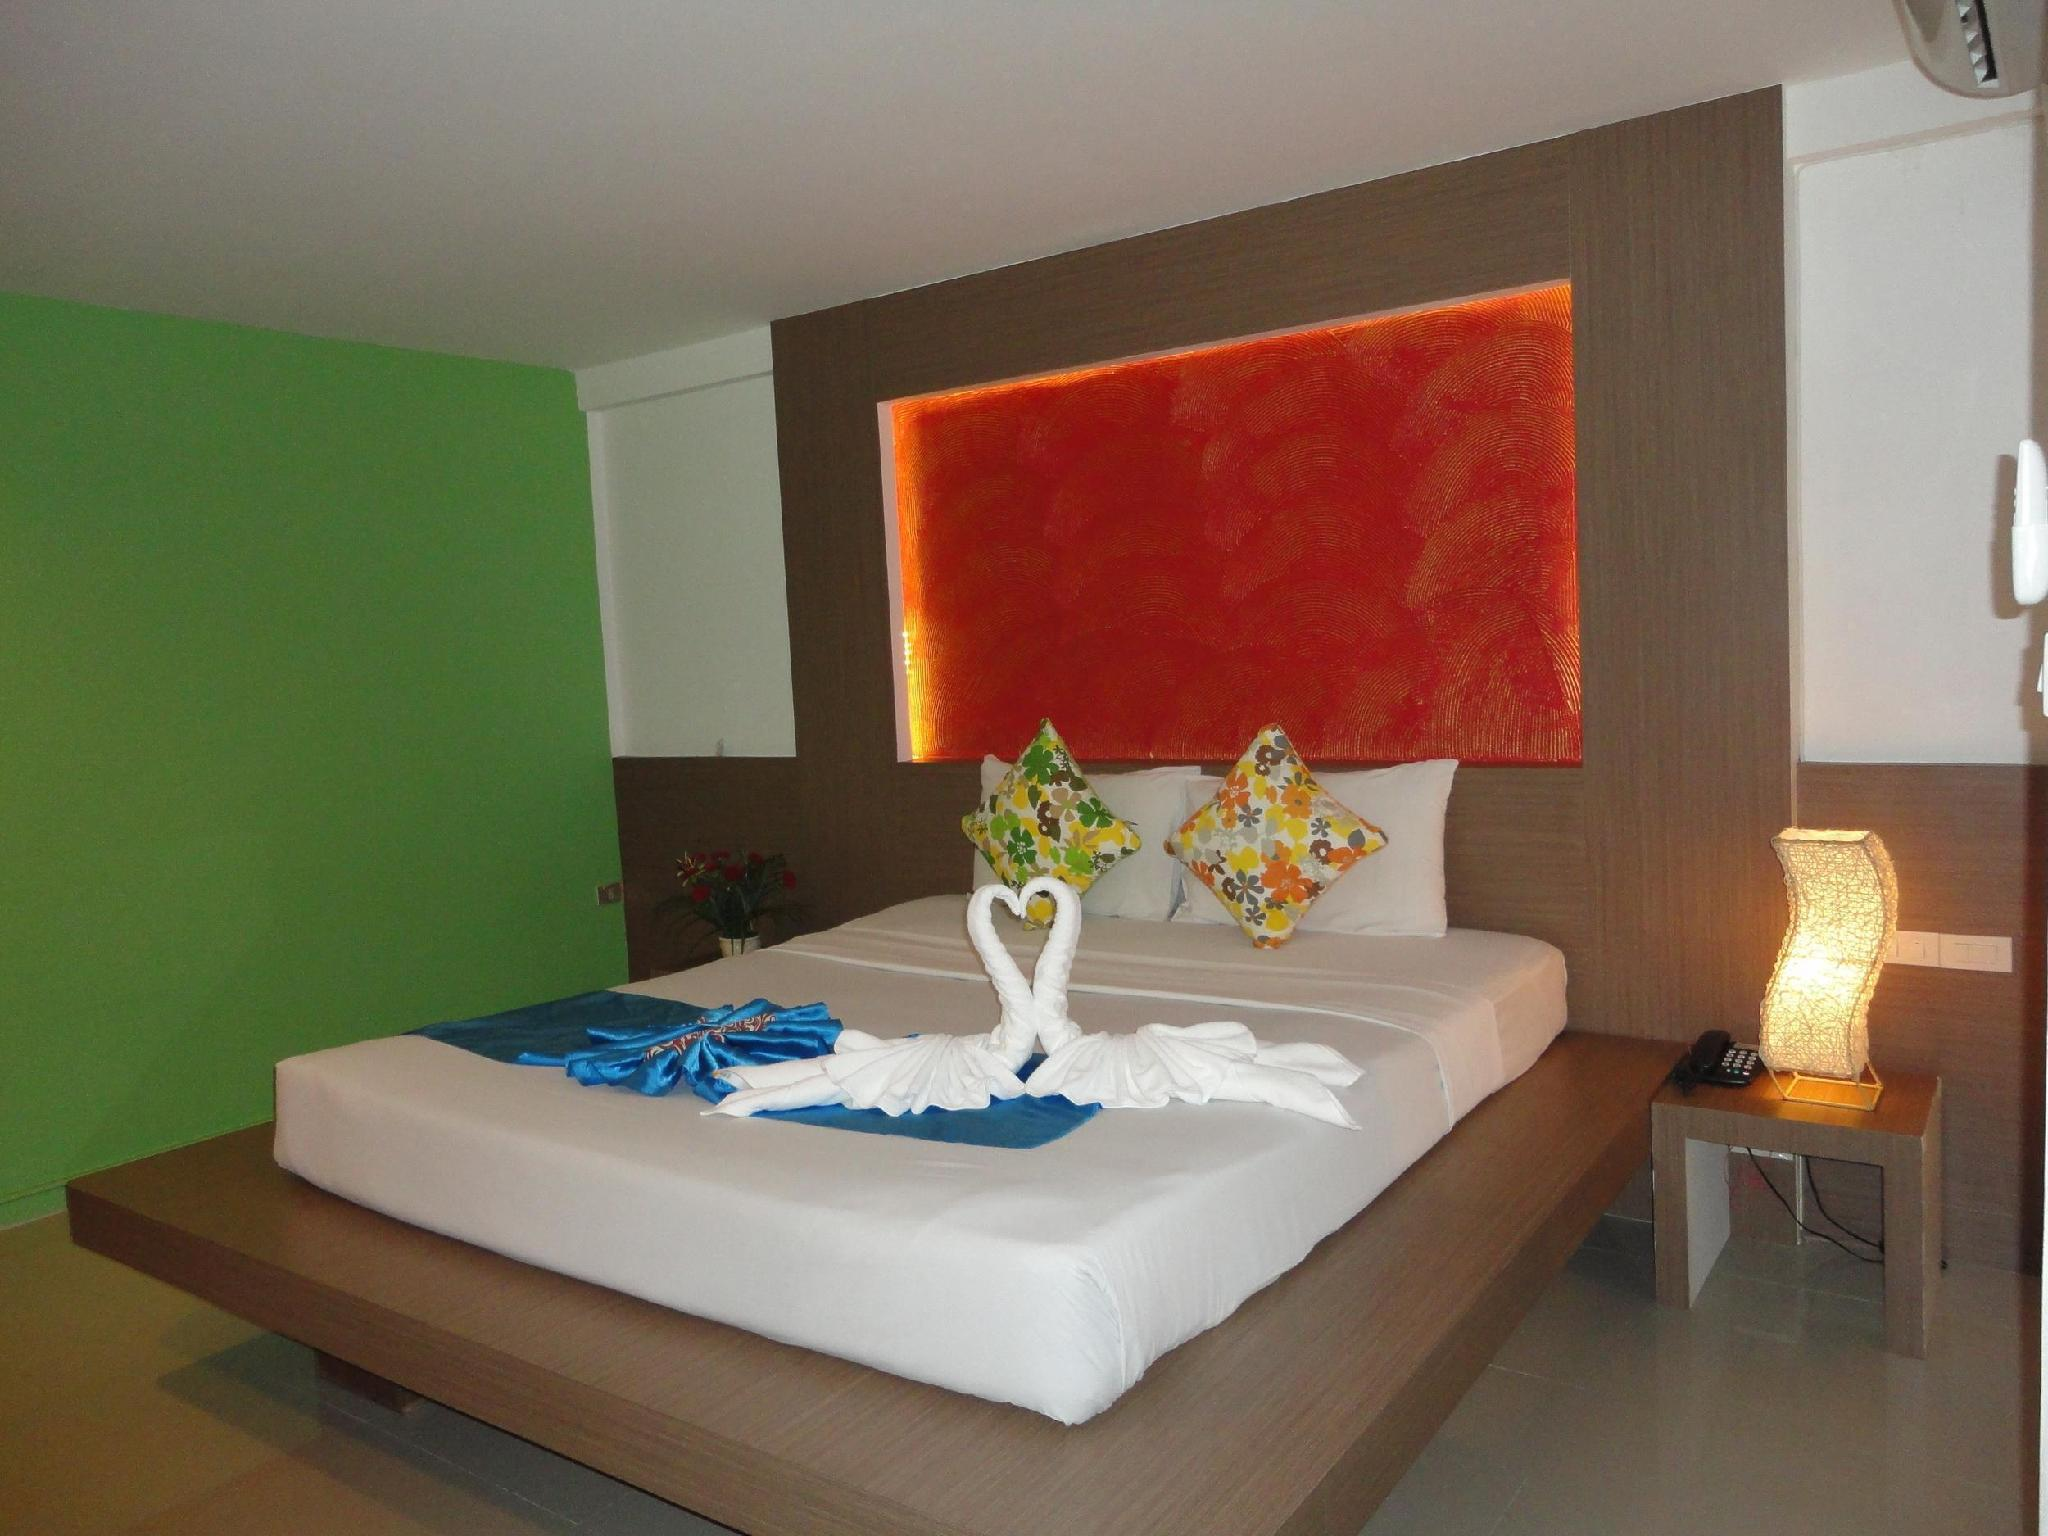 Lamoon Hotel @ Phuket ละมุน โฮเต็ล แอท ภูเก็ต